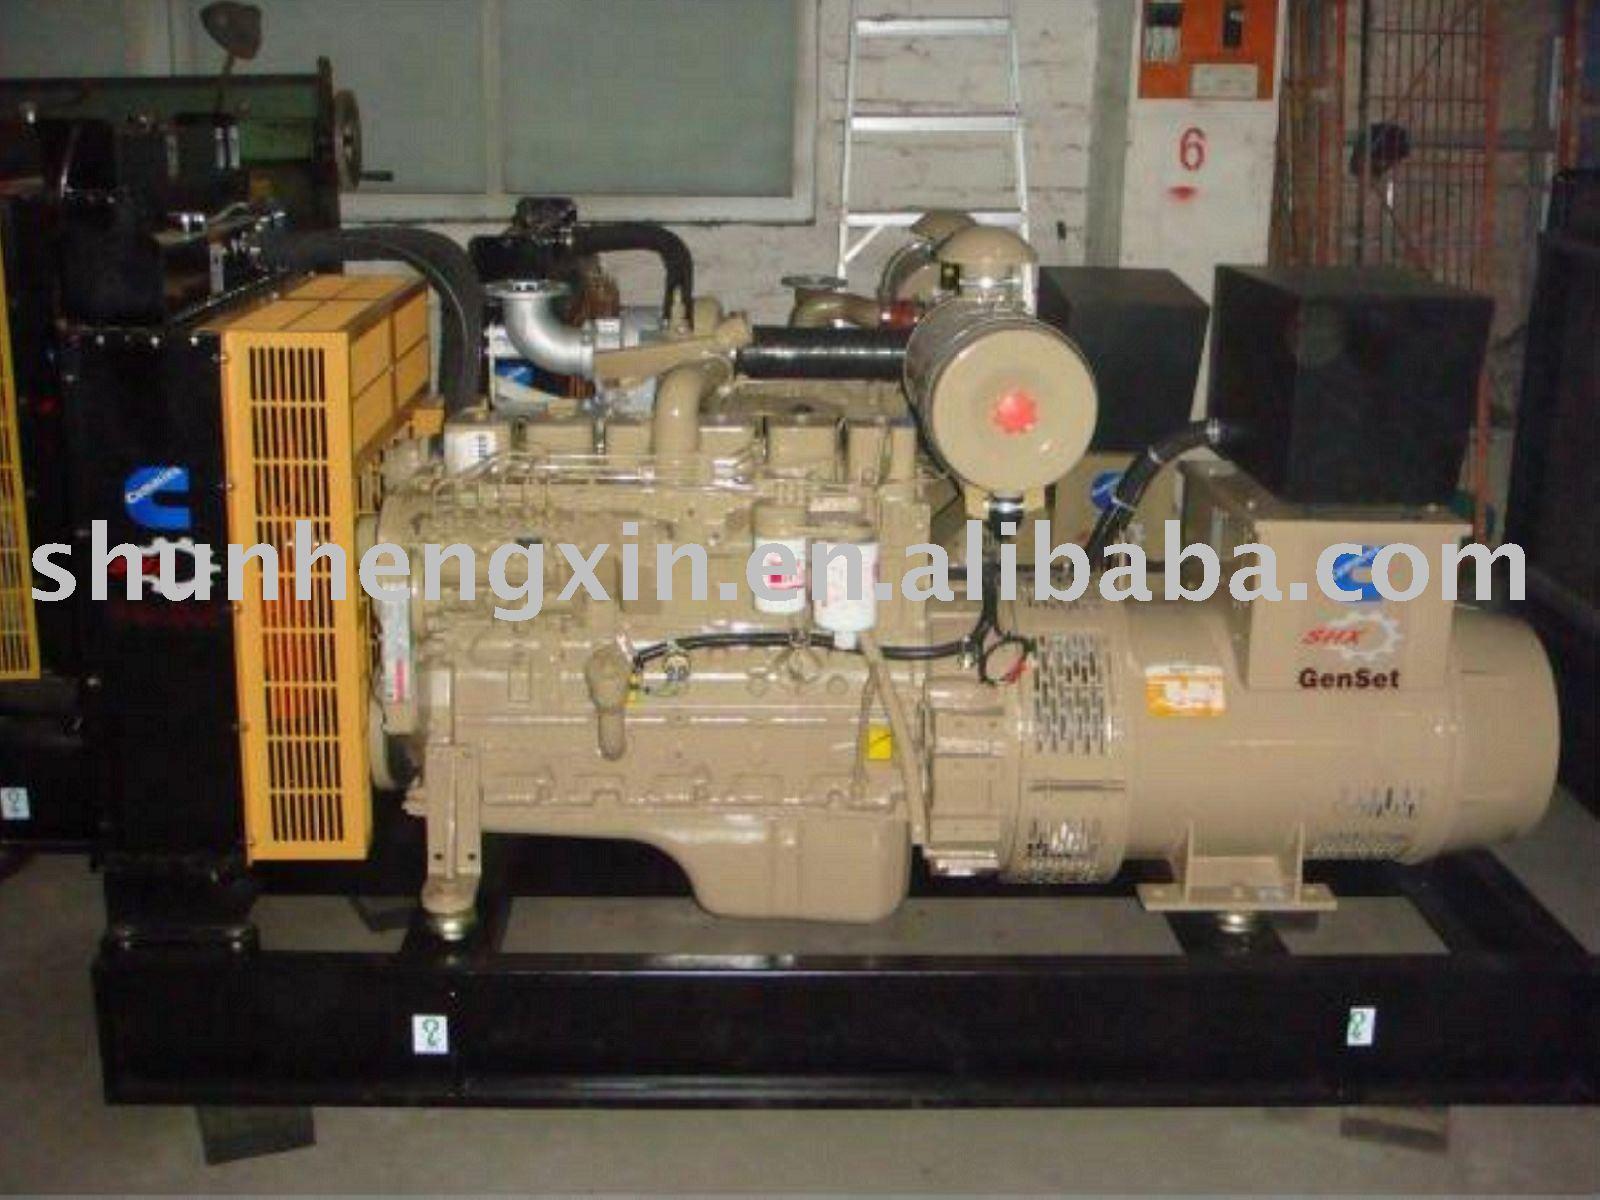 100 250kva Diesel Generators With Cummins Engines Buy 100kva